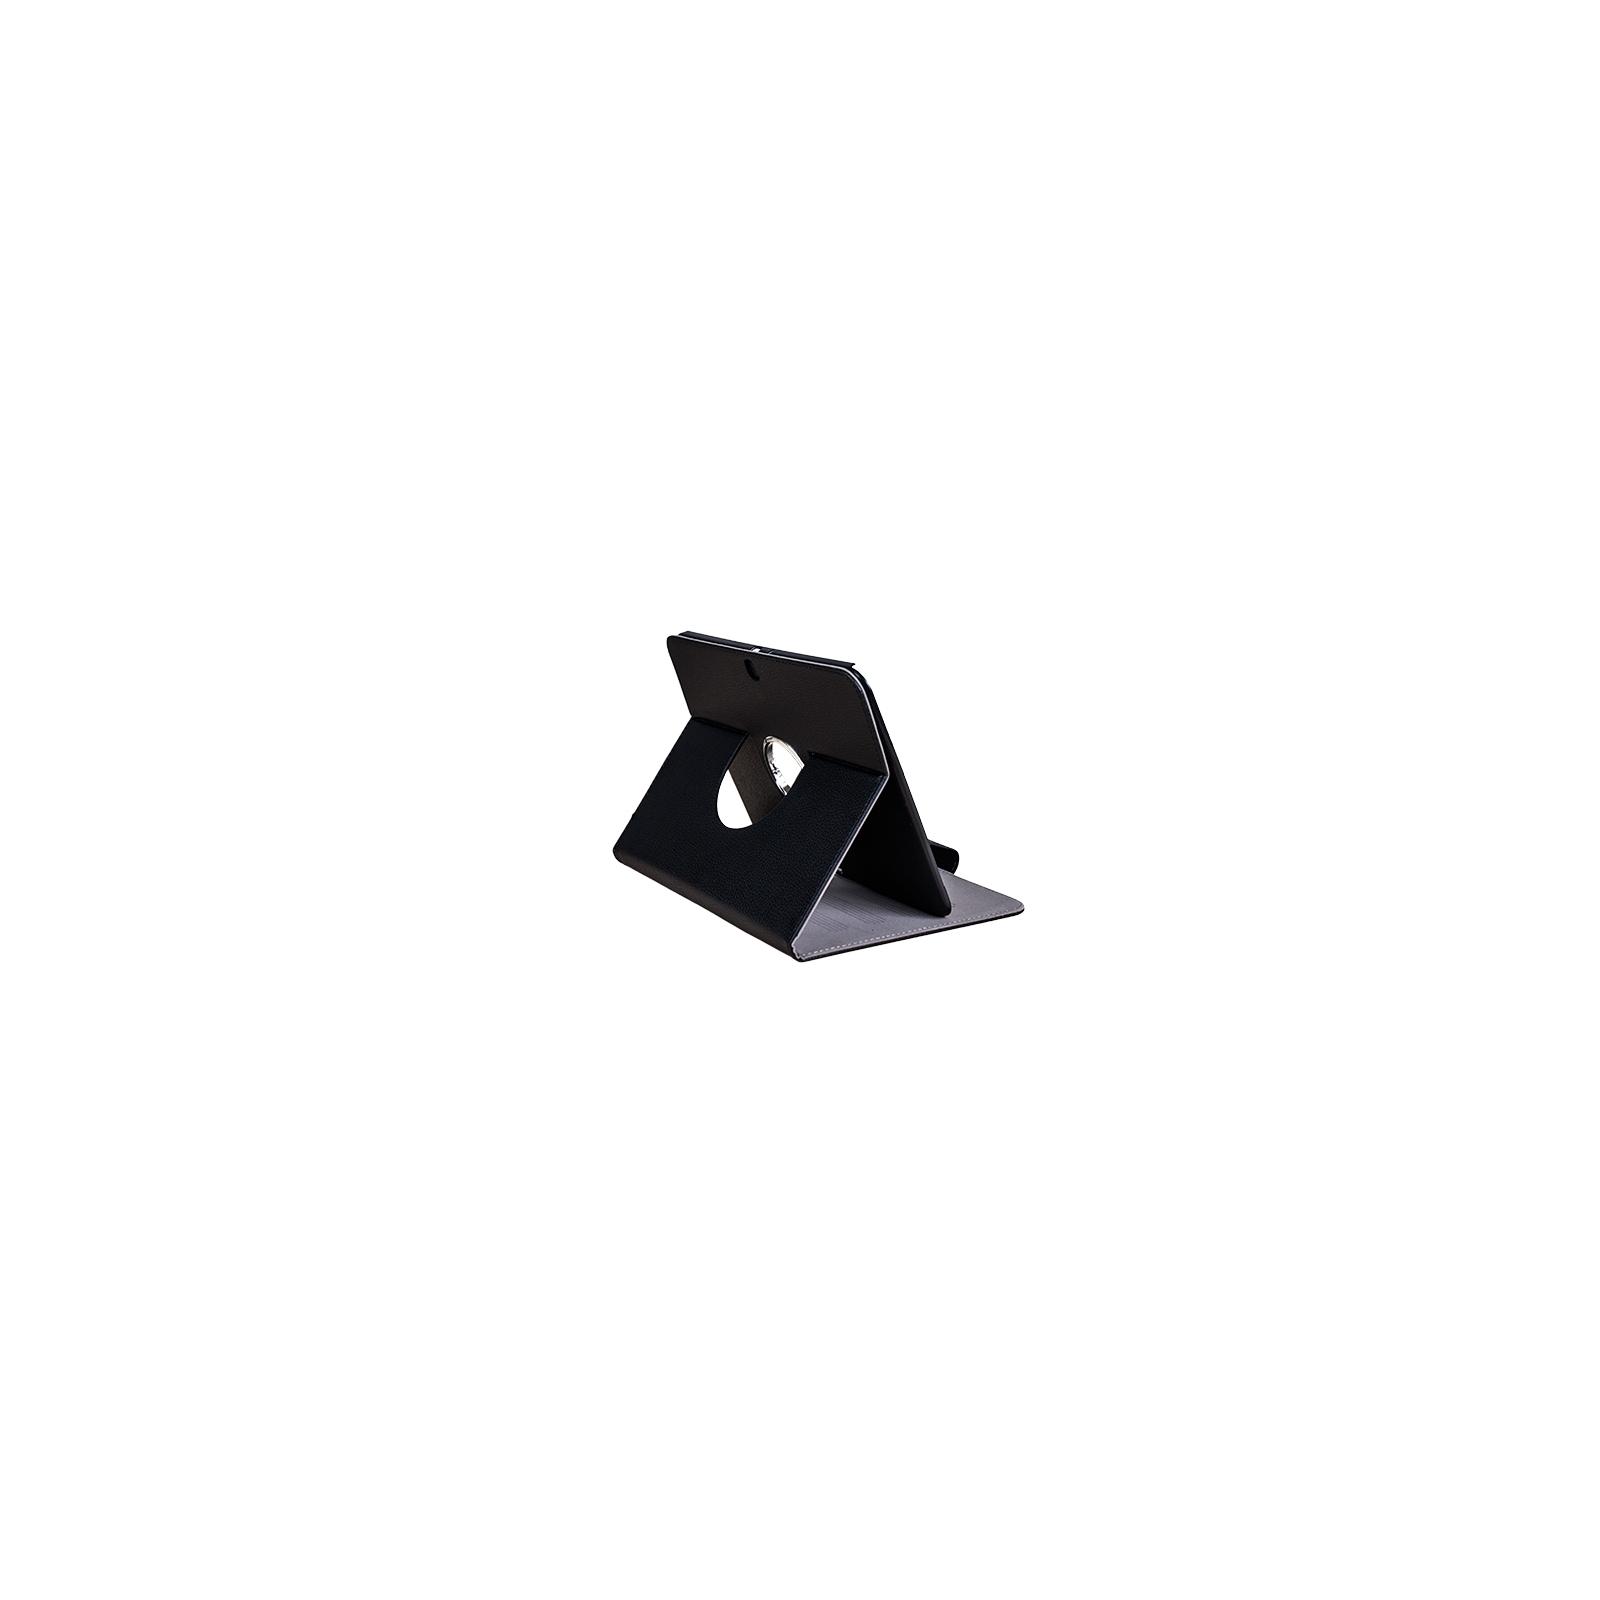 Чехол для планшета Drobak 10.1 Galaxy Tab3 (GT-P5210) Black (216033) изображение 3